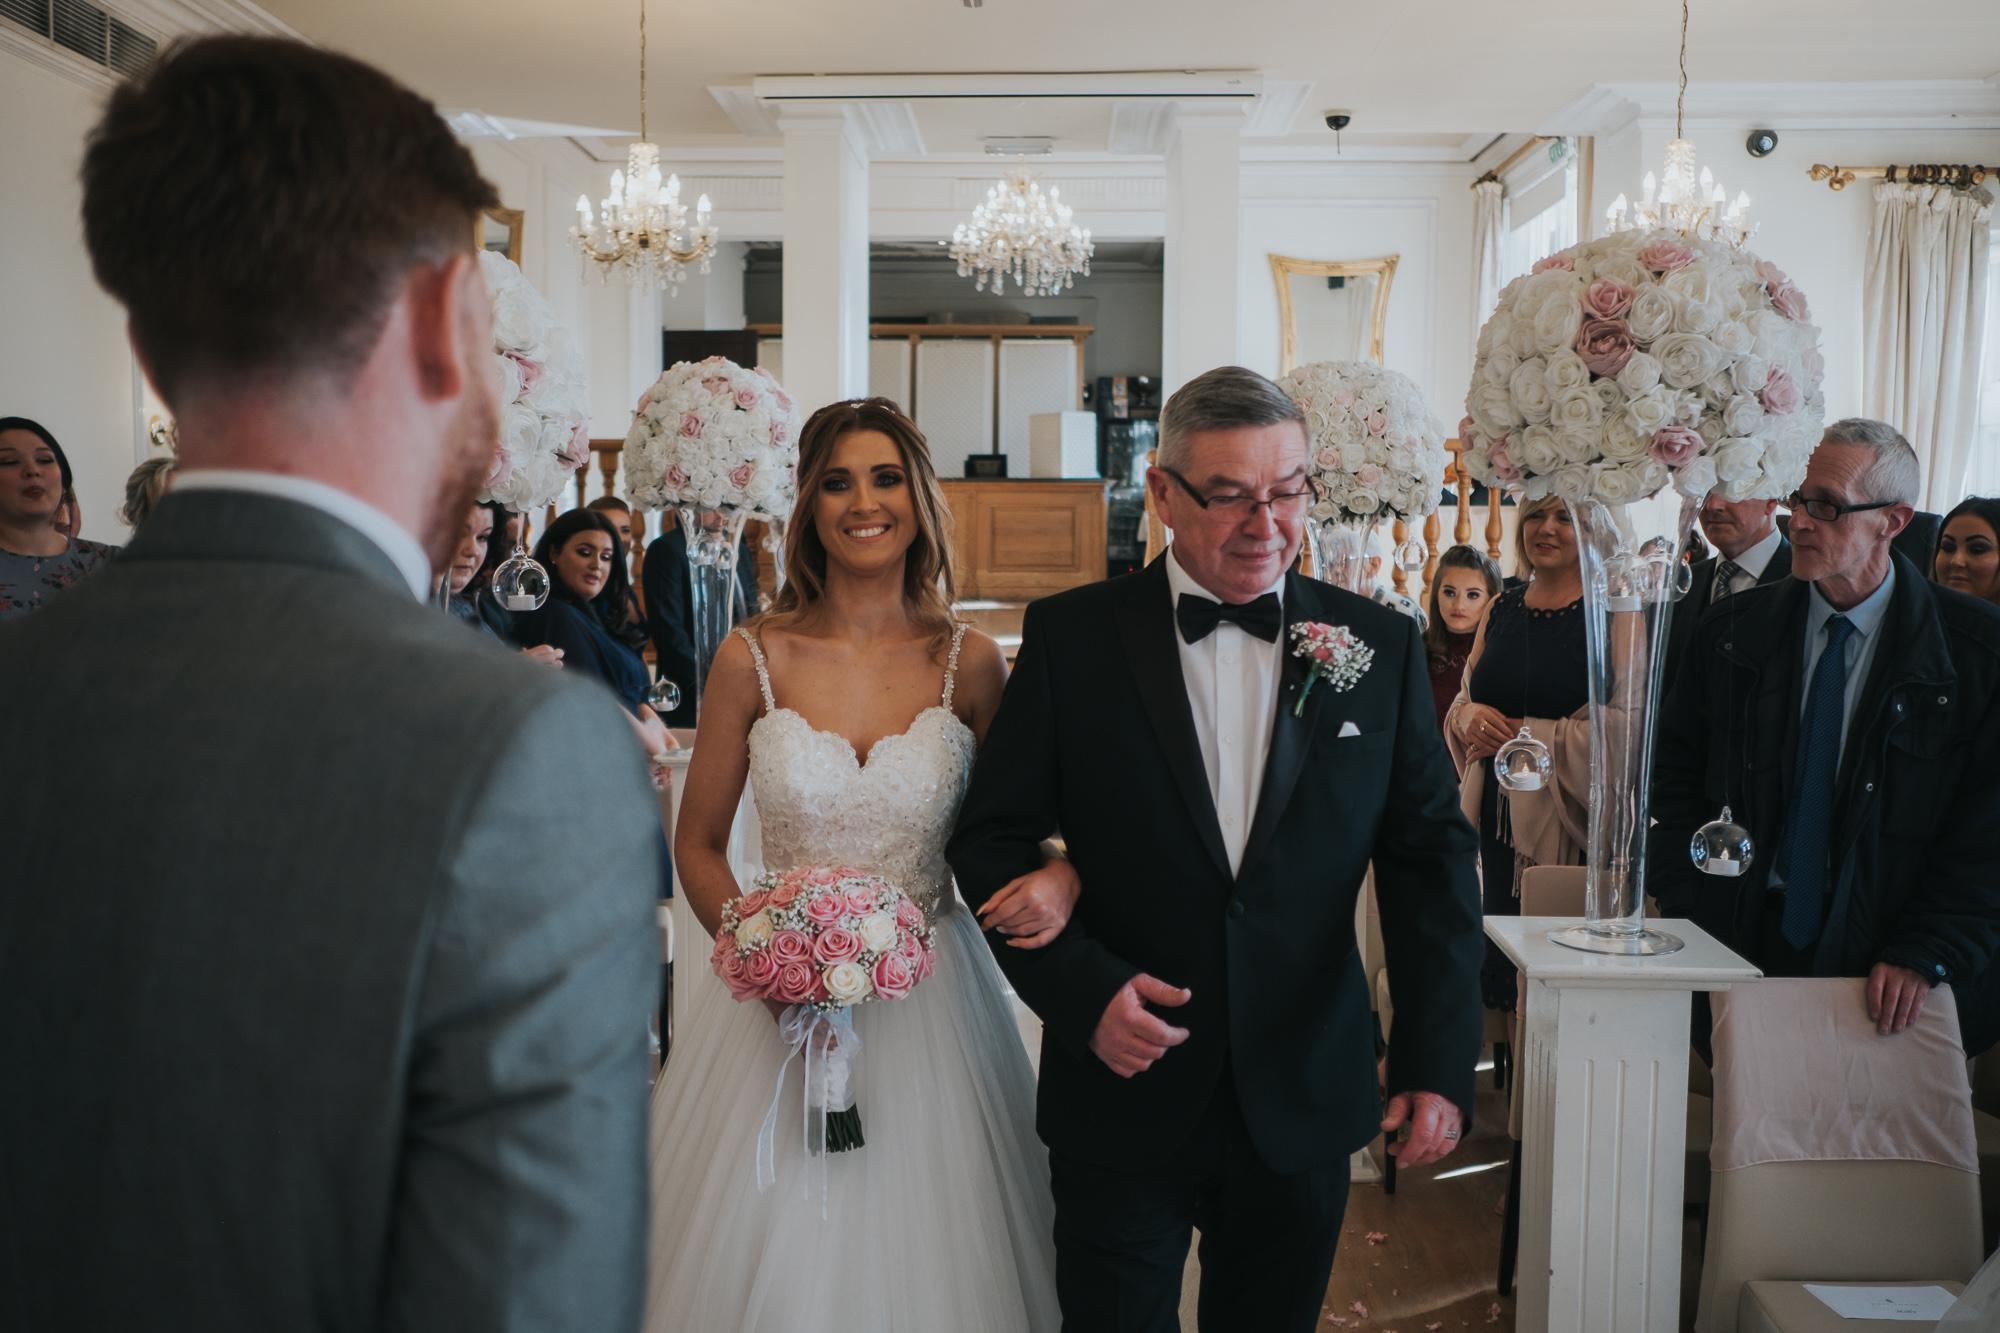 West Tower Exclusive Wedding Venue wedding photography merseyside and lancashire wedding photographer (25 of 60).jpg